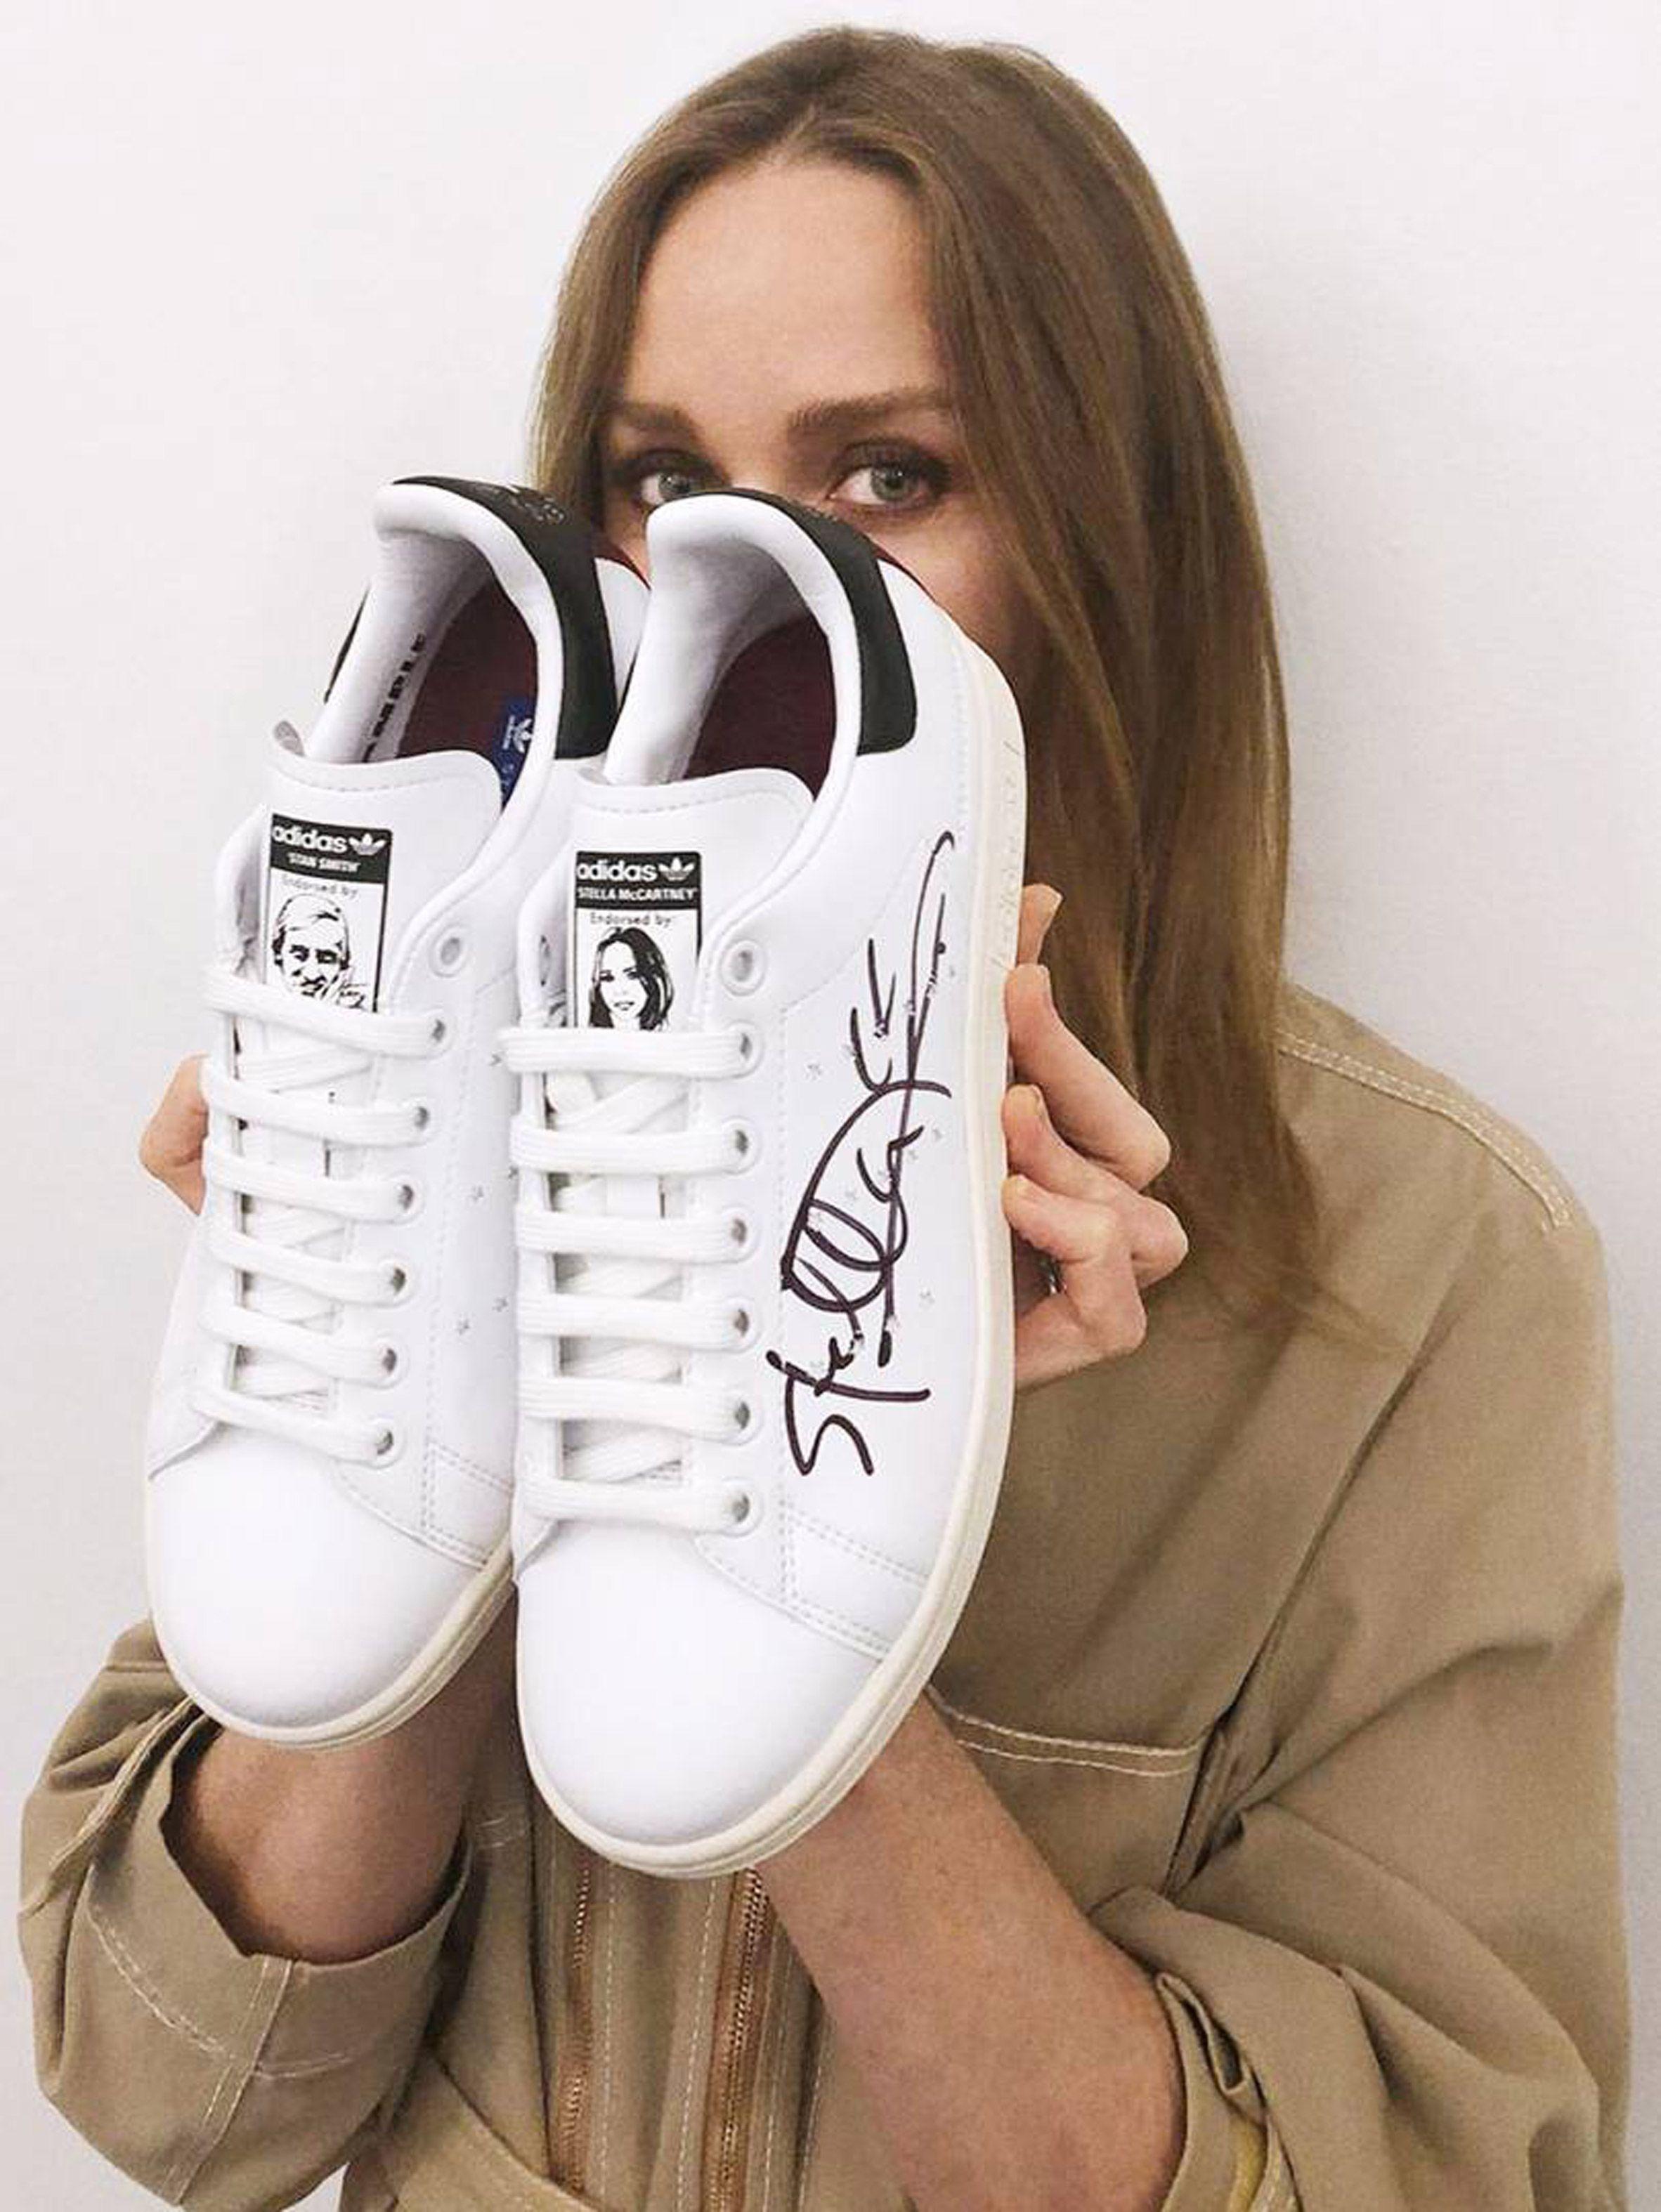 Details about Women's adidas Original's Stan Smith Size 6.5 Glitter Stan Smiths